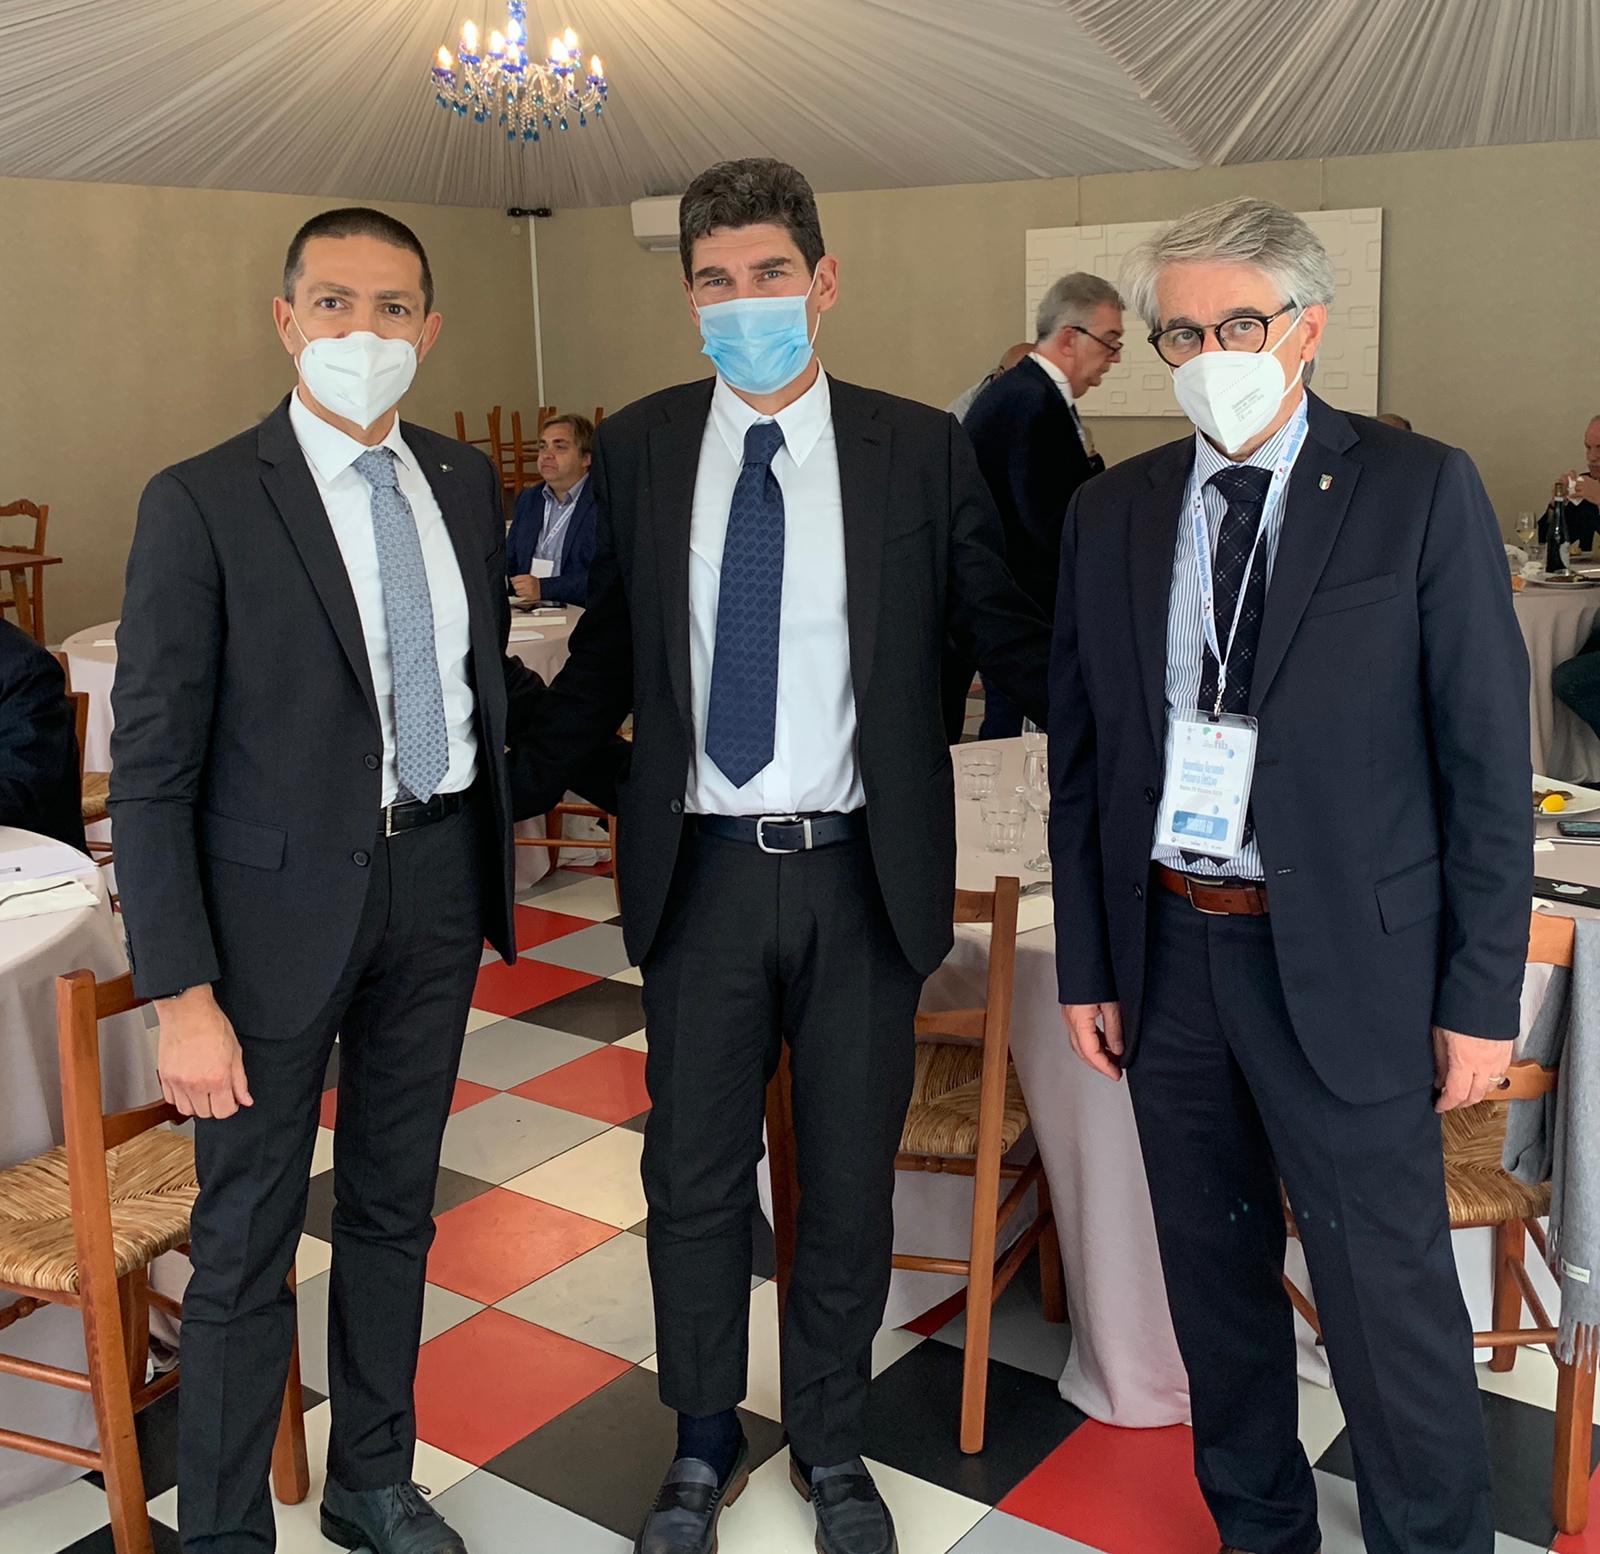 Favre insieme al Presidene De Sanctis e allaltro vice Rosati